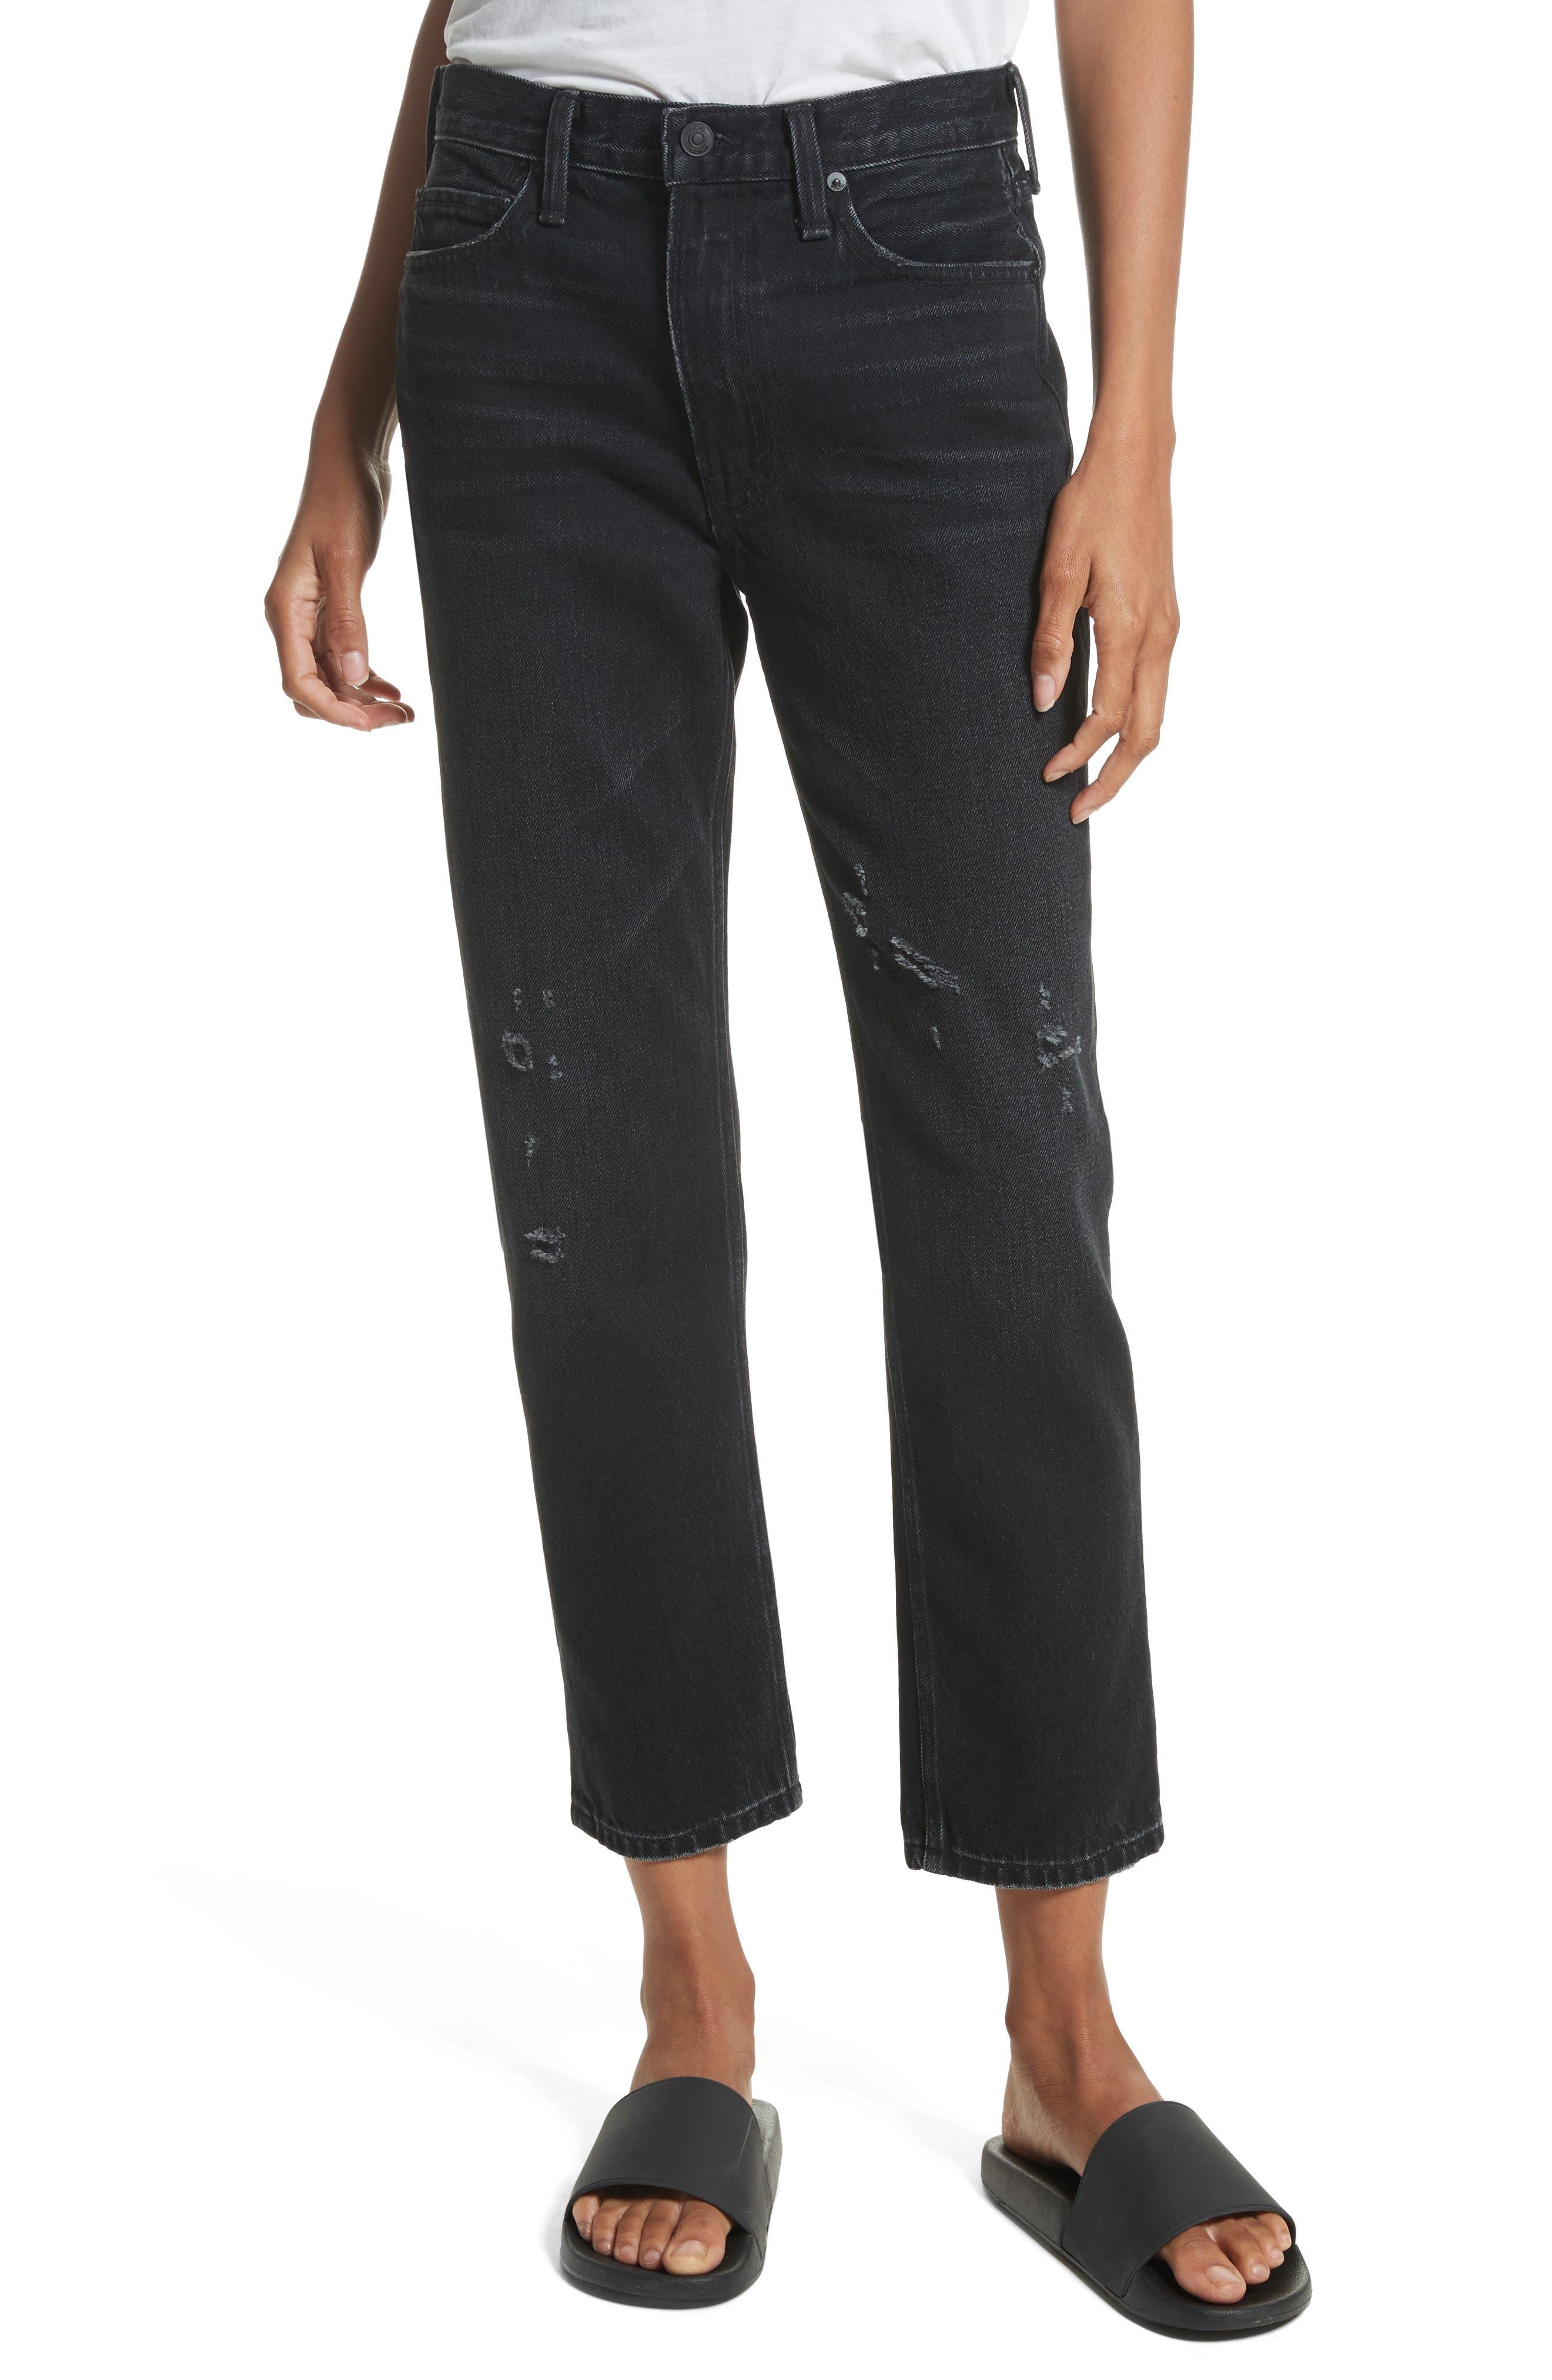 Vince High Waist Vintage Straight Jeans